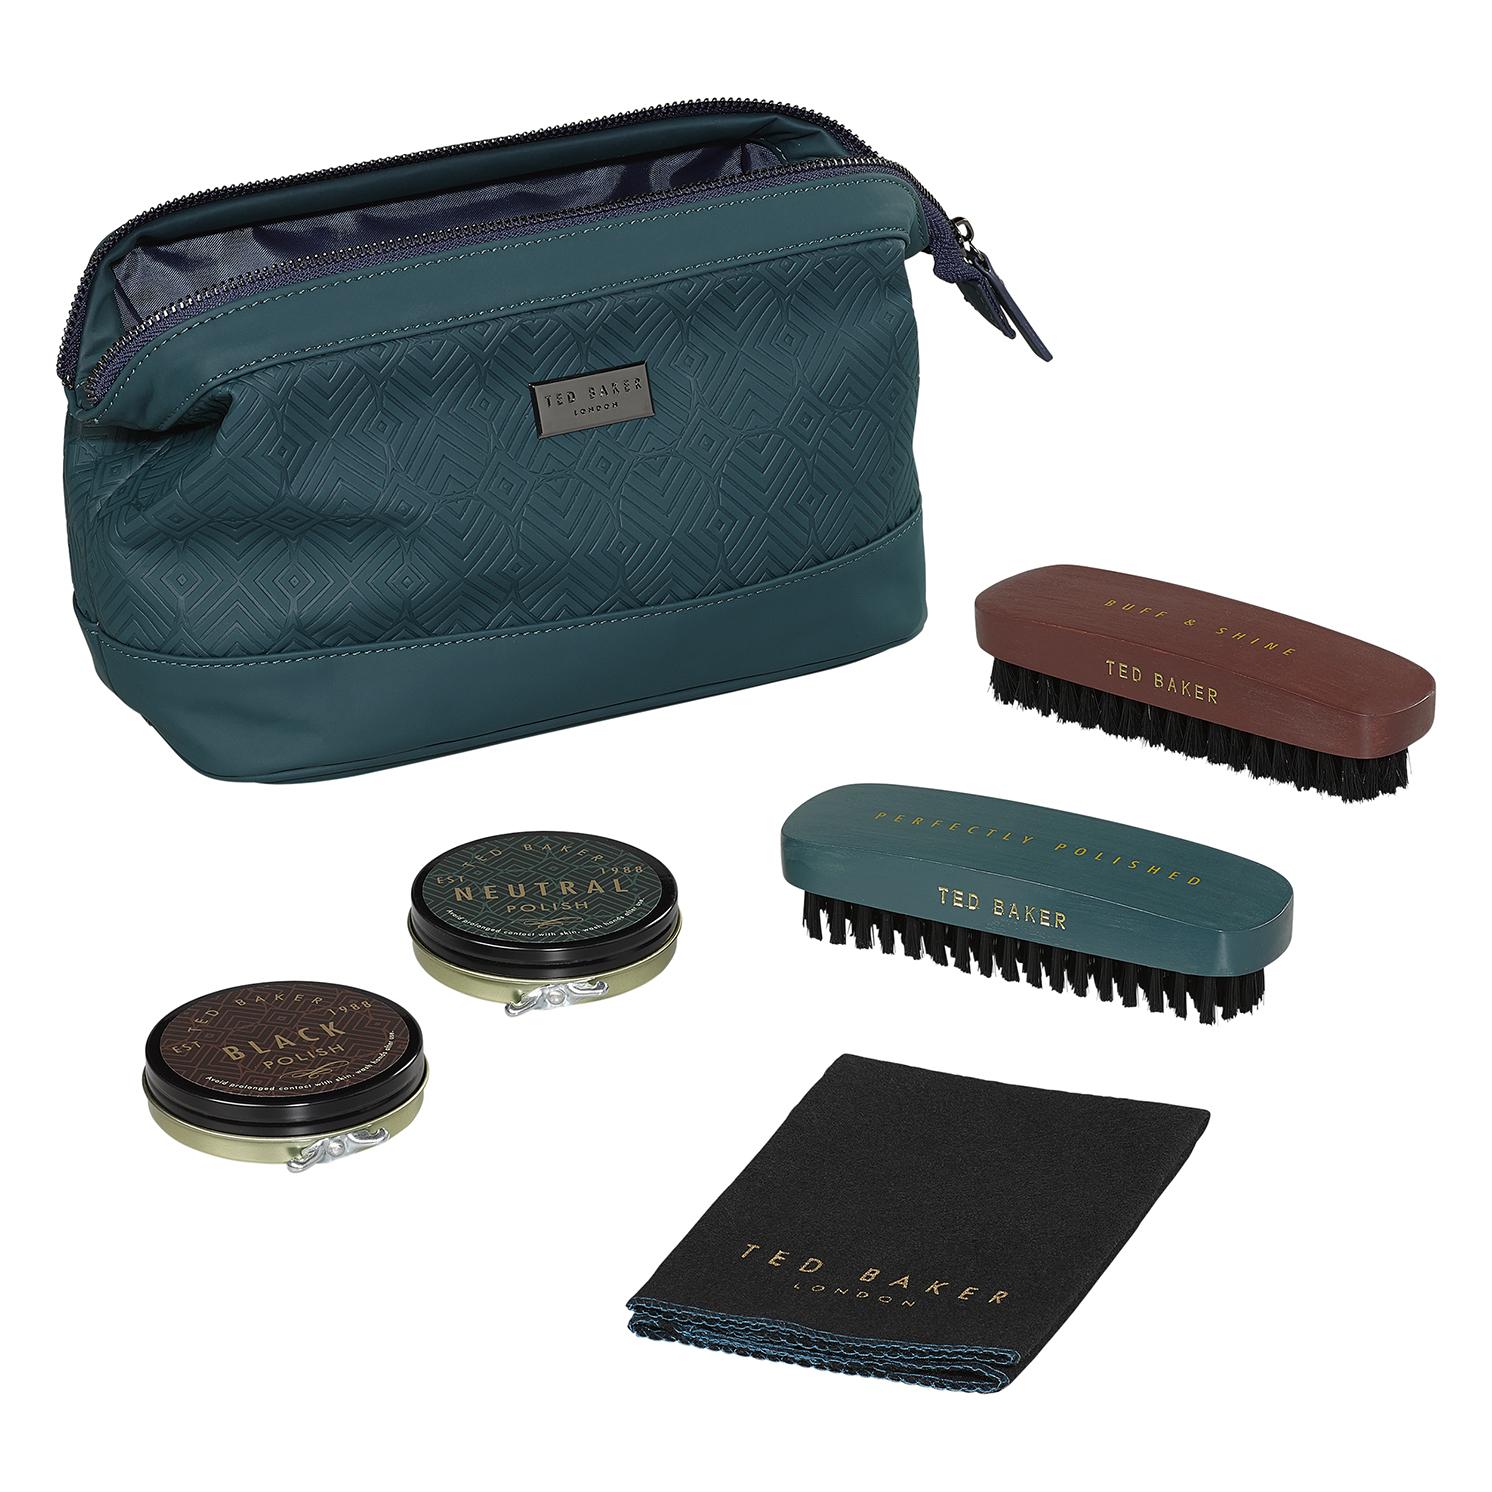 Ted Baker – 5 Piece Shoe Shine Kit in Teal Green Zip Case